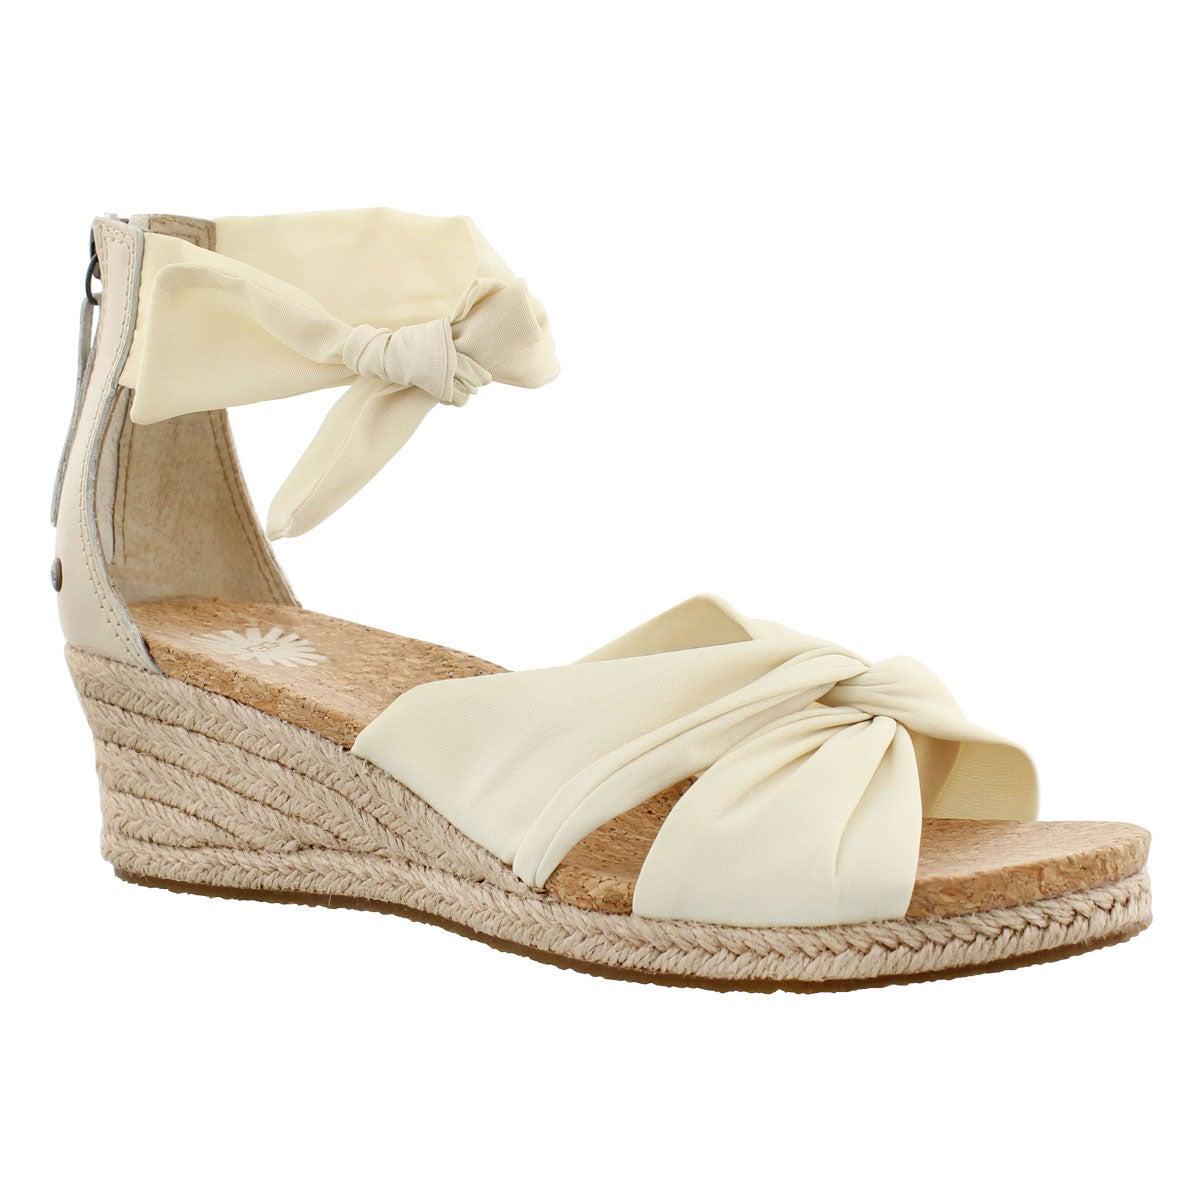 Lds Starla cream fabric wedge sandal